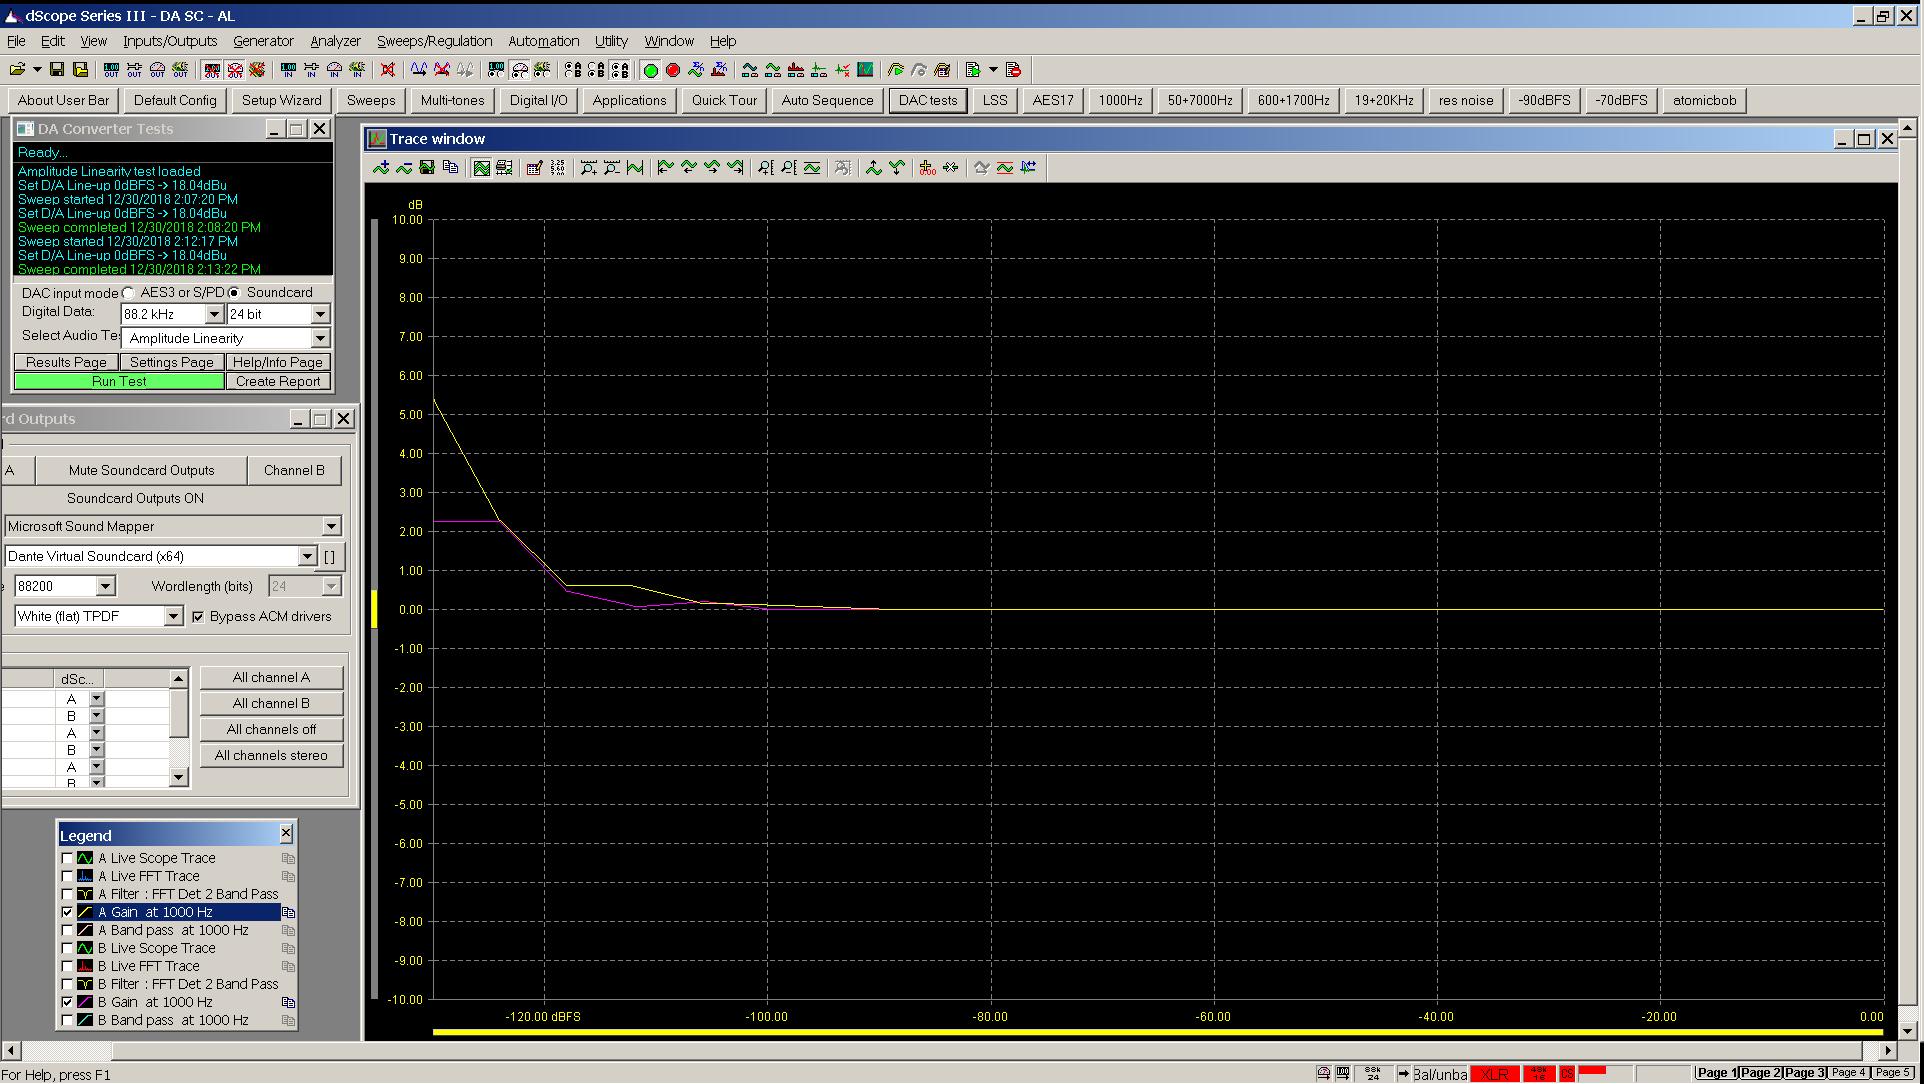 20181227-51 convert2 Bal 1 KHz gain linearity - AES - Dante VSC - 88K int clk.PNG